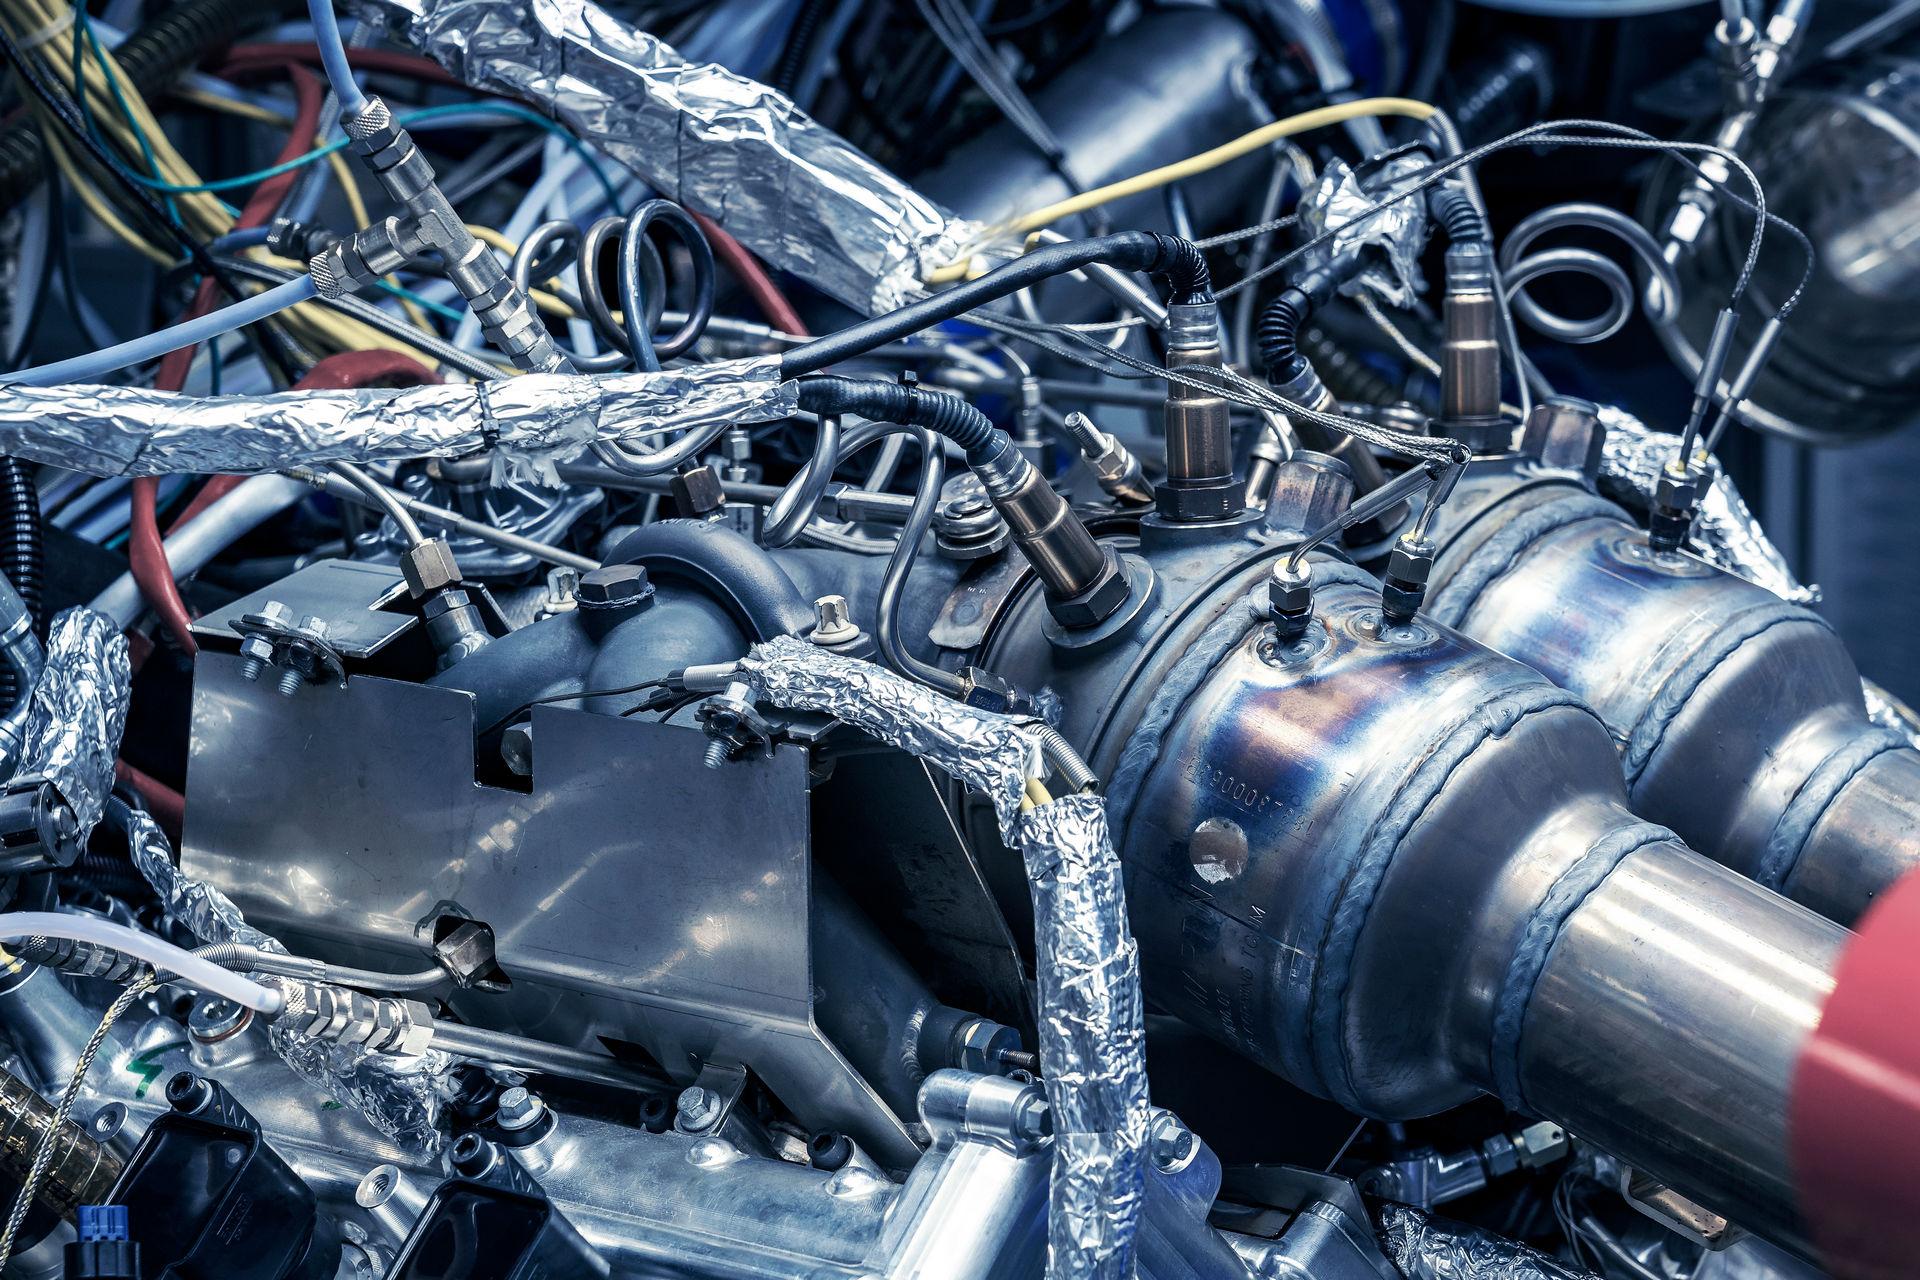 New-Aston-Martin-V6-Engine-6